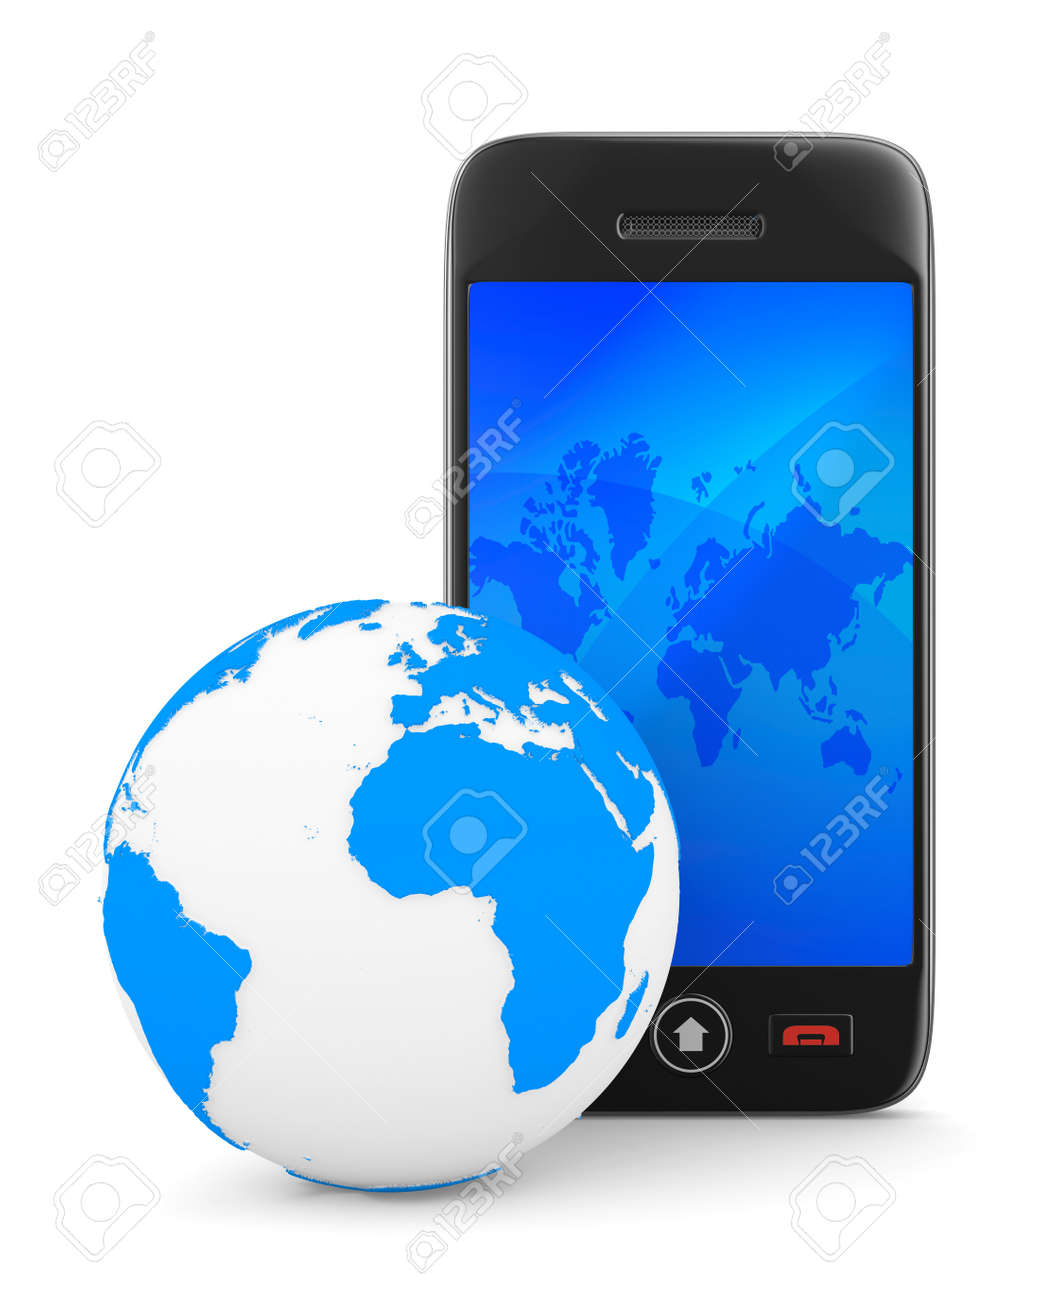 phone on white background. Isolated 3D image Stock Photo - 11340473